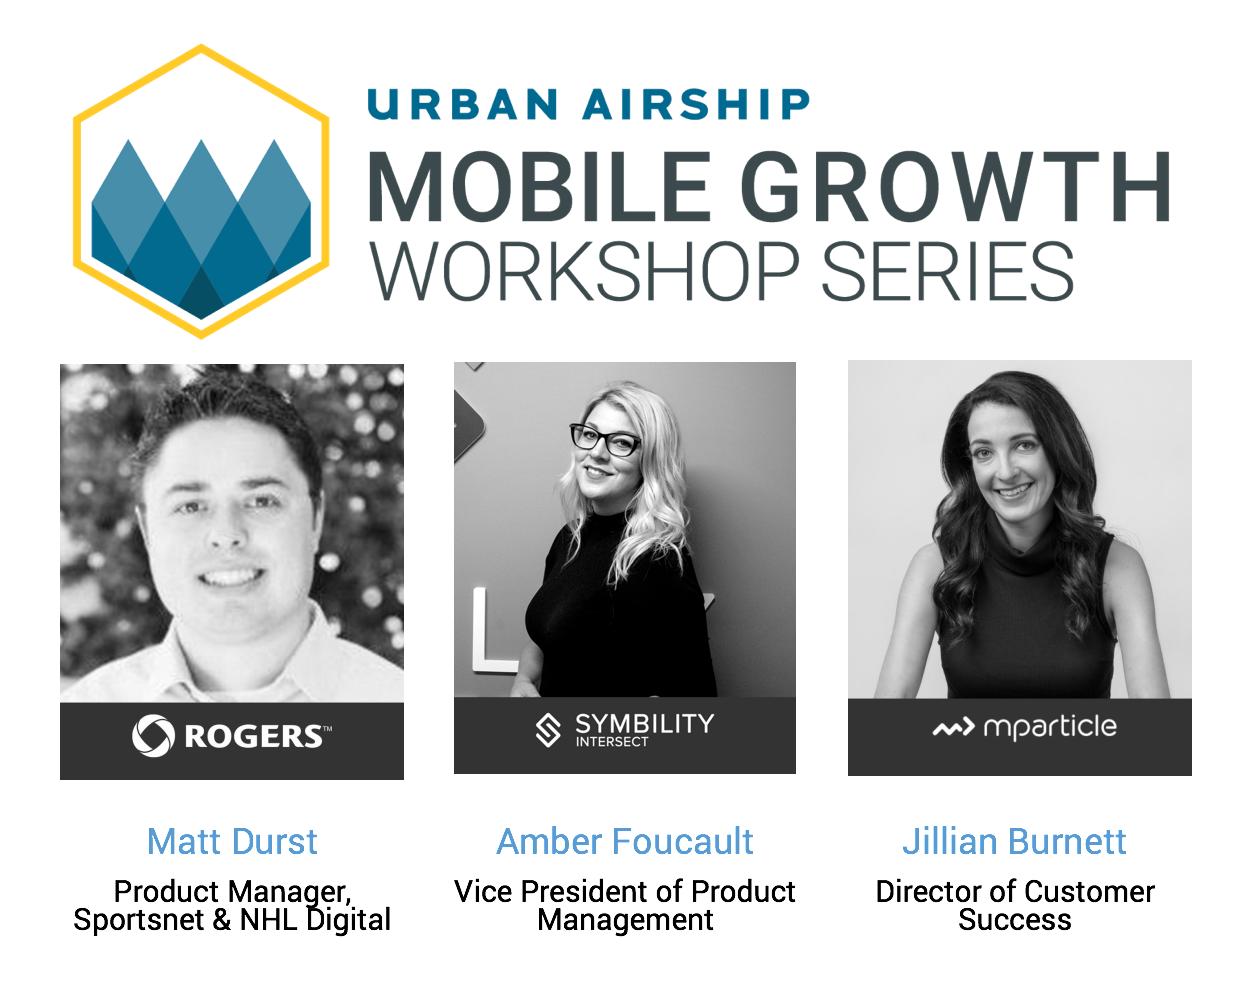 toronto-mobile-growth-workshop-urban-airship